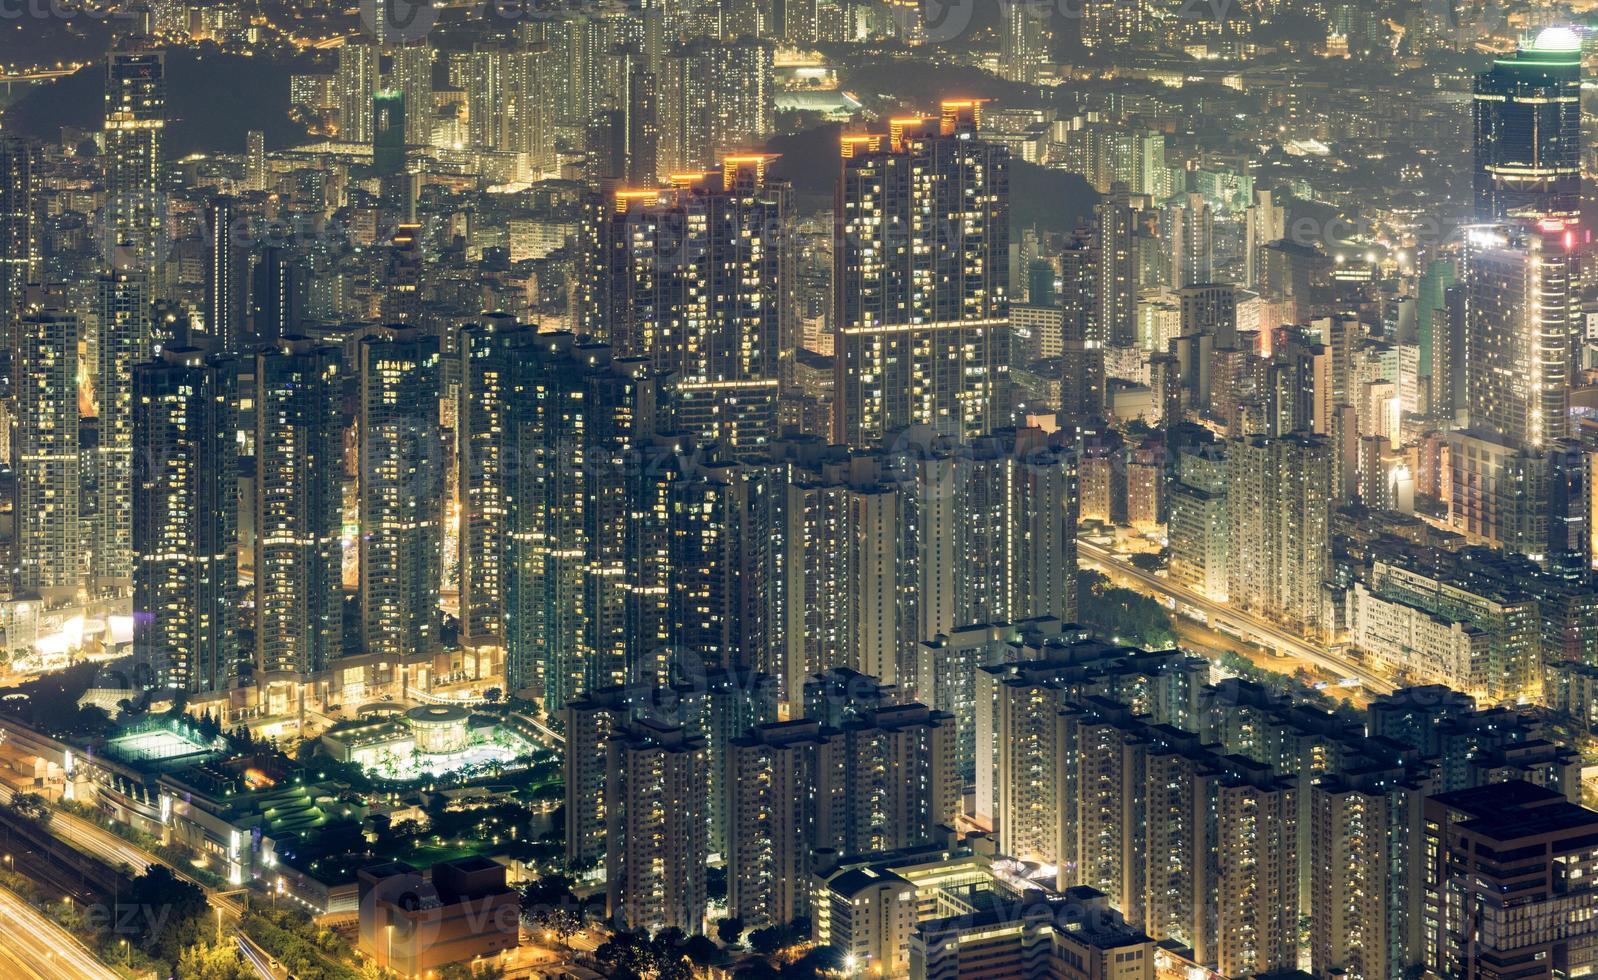 hong kong bostadsområde foto